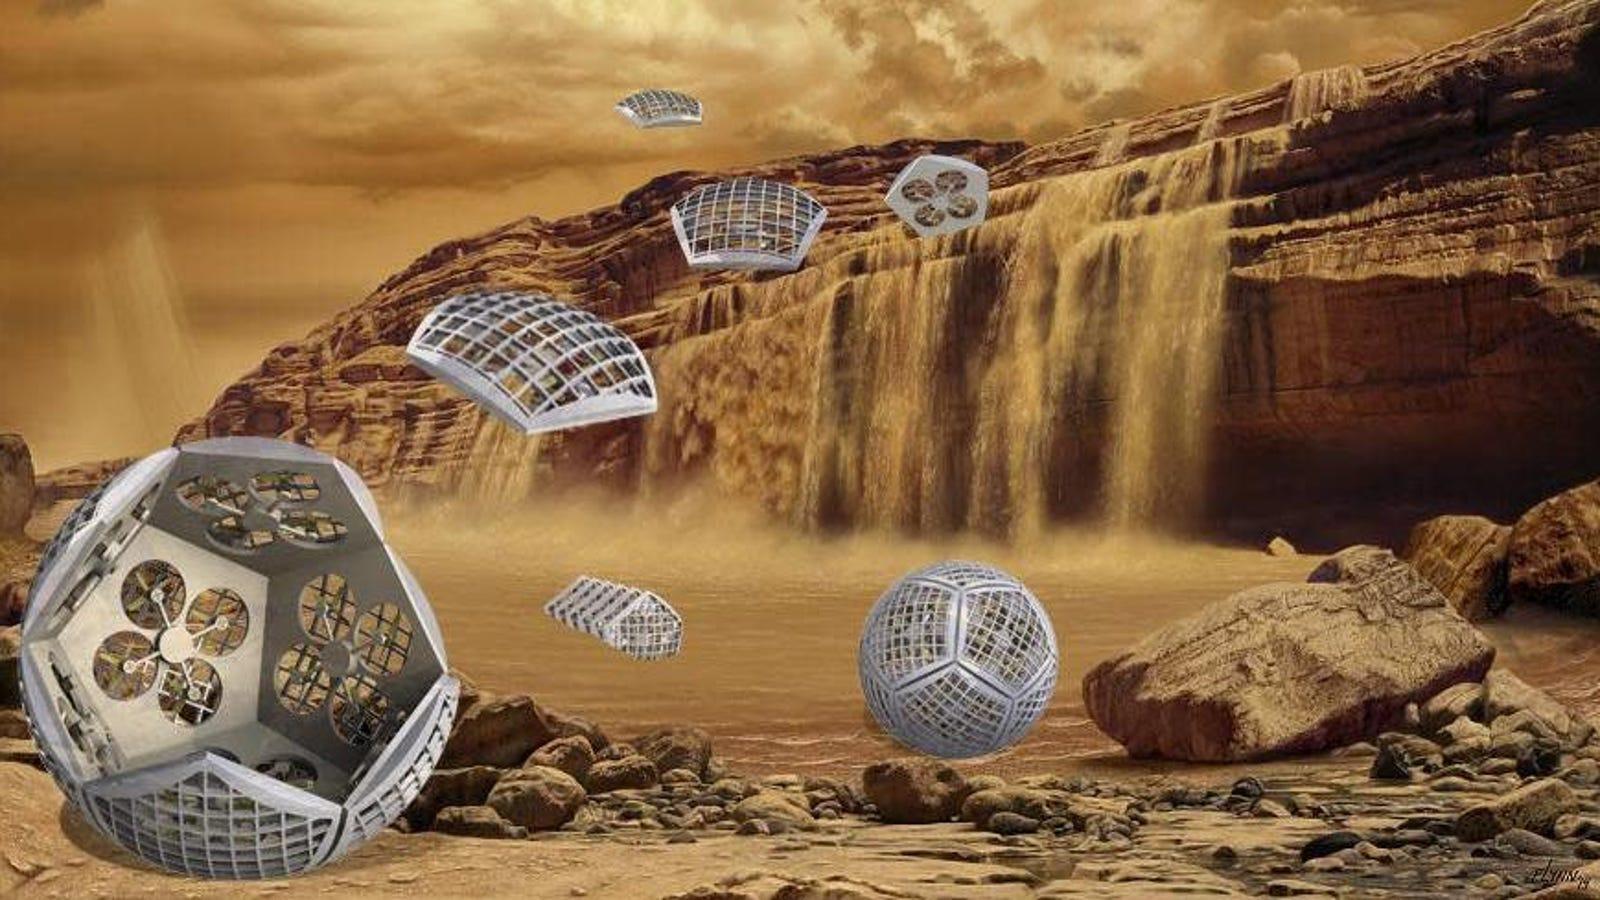 Cool NASA Concept Envisions a Shapeshifting Robot to Explore Saturn's Moon Titan